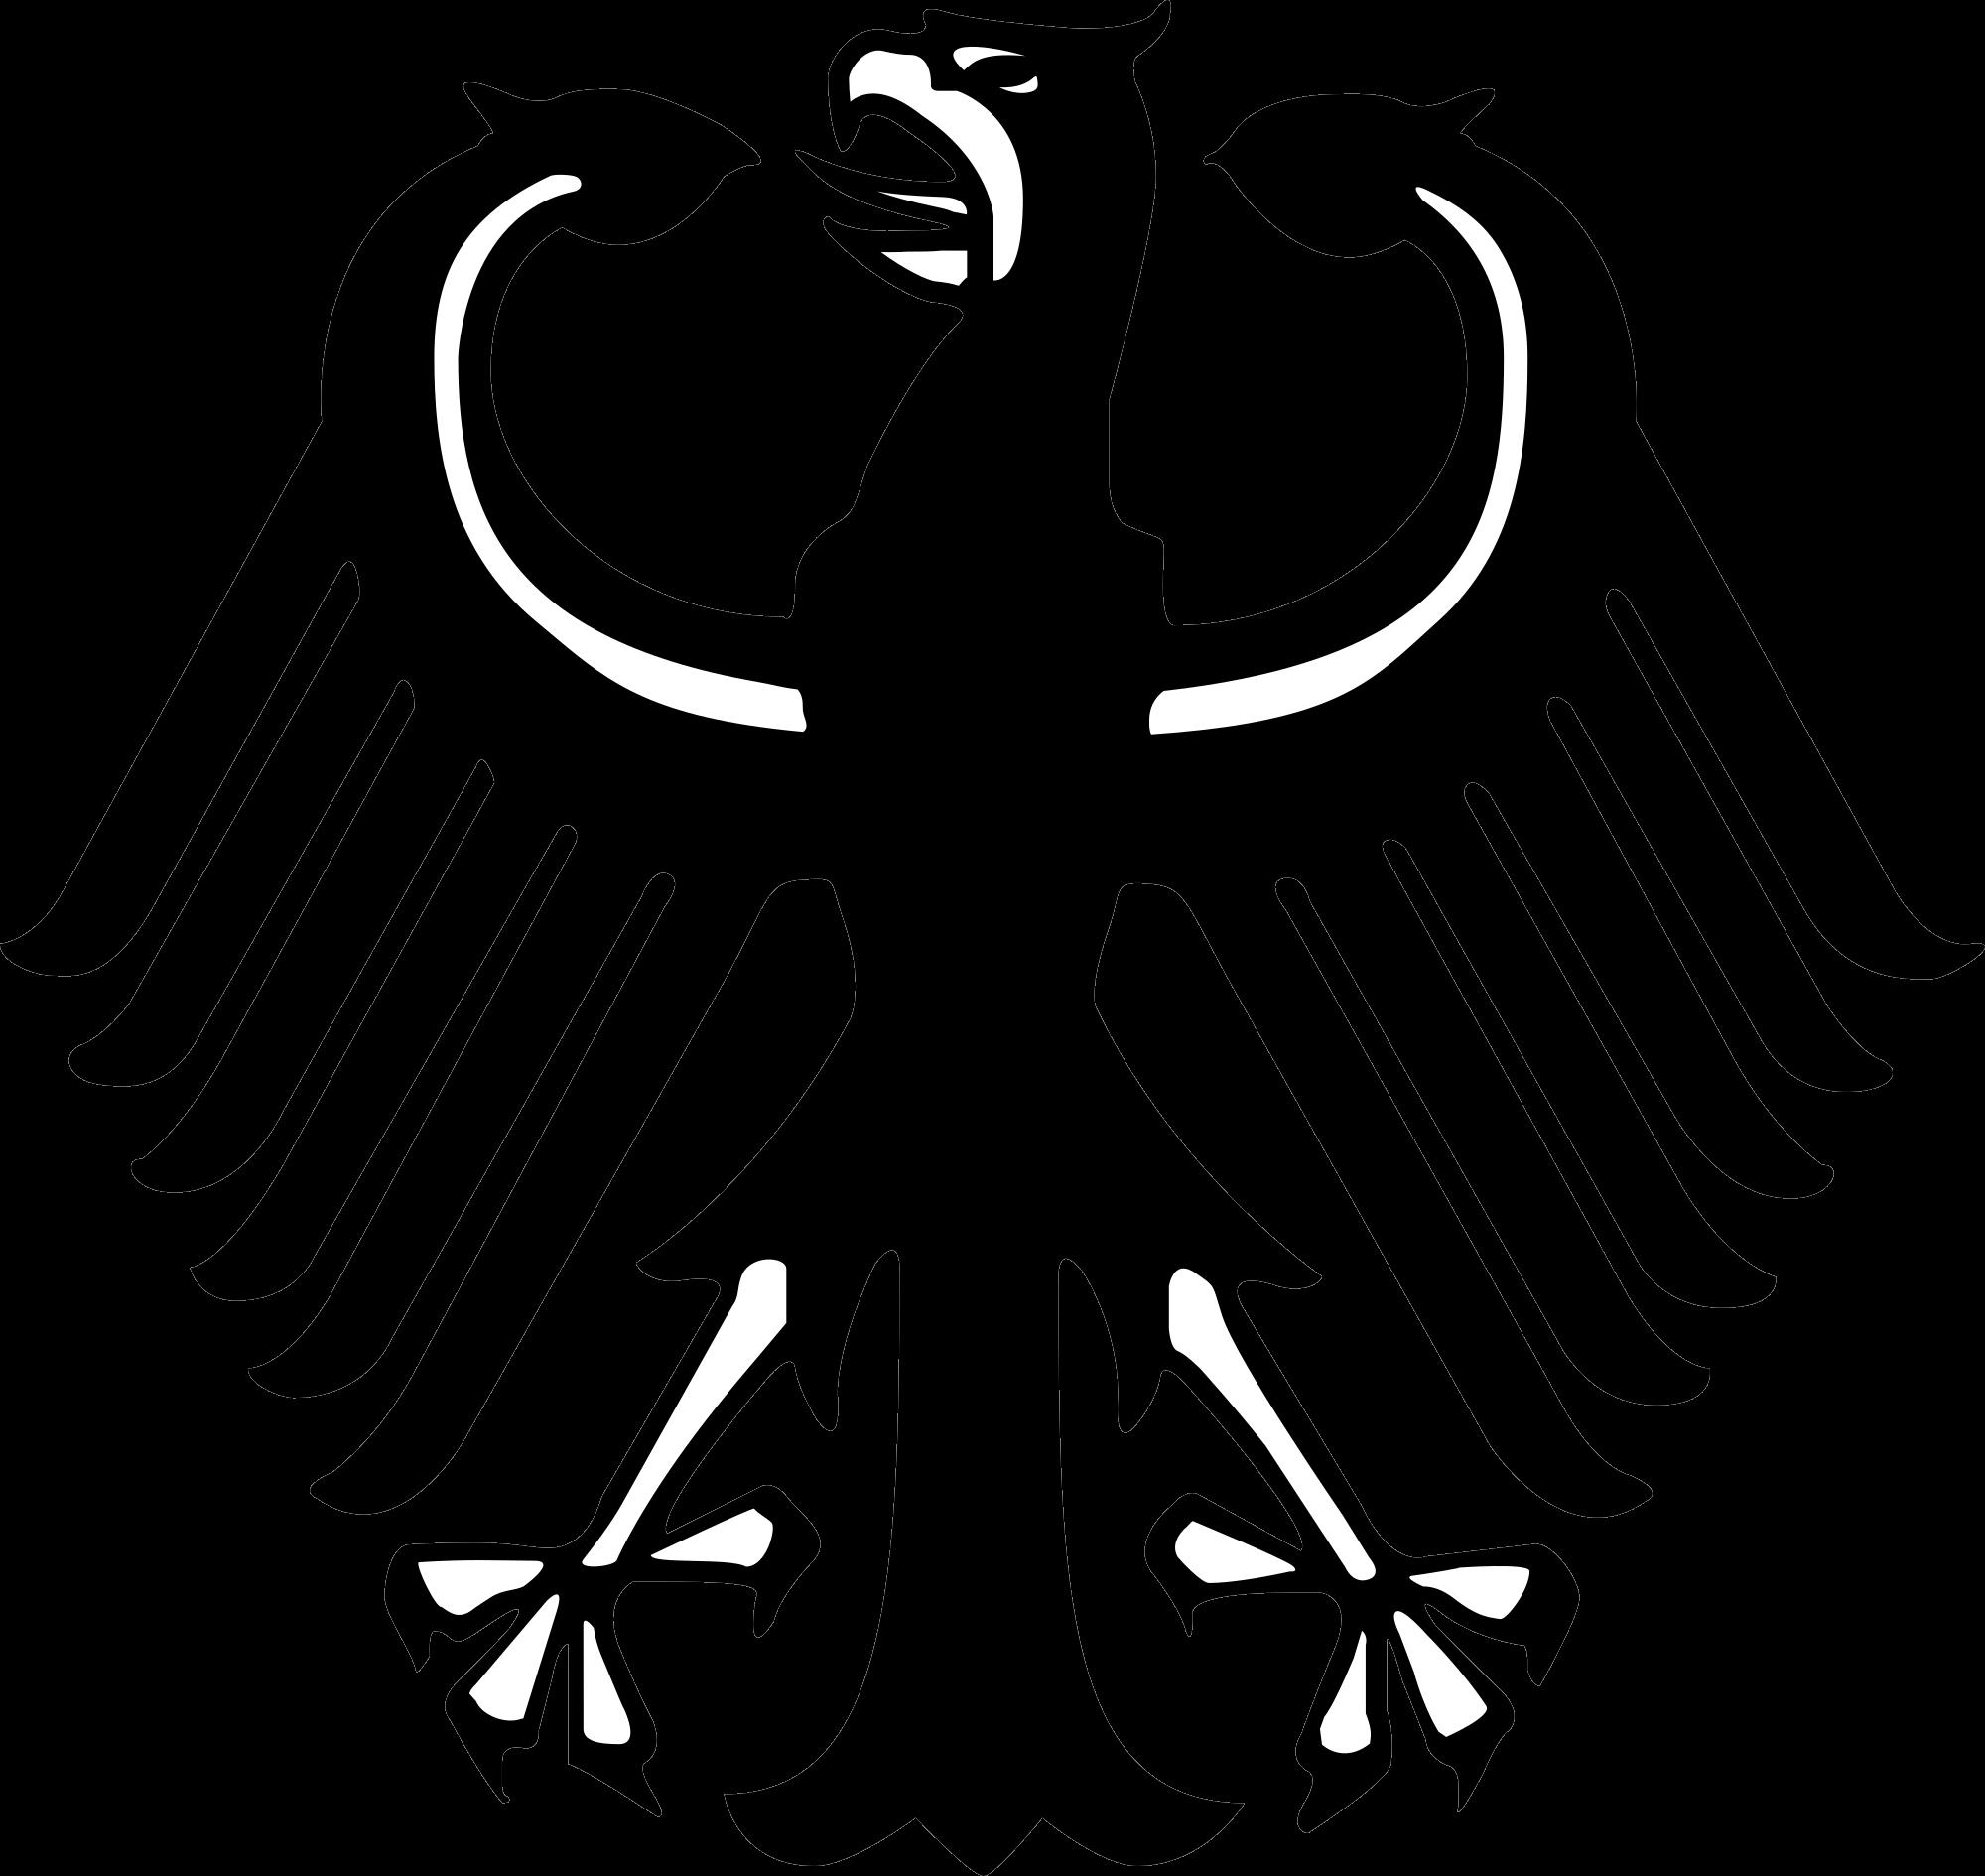 Weimar republic coat of. Germany clipart weimer